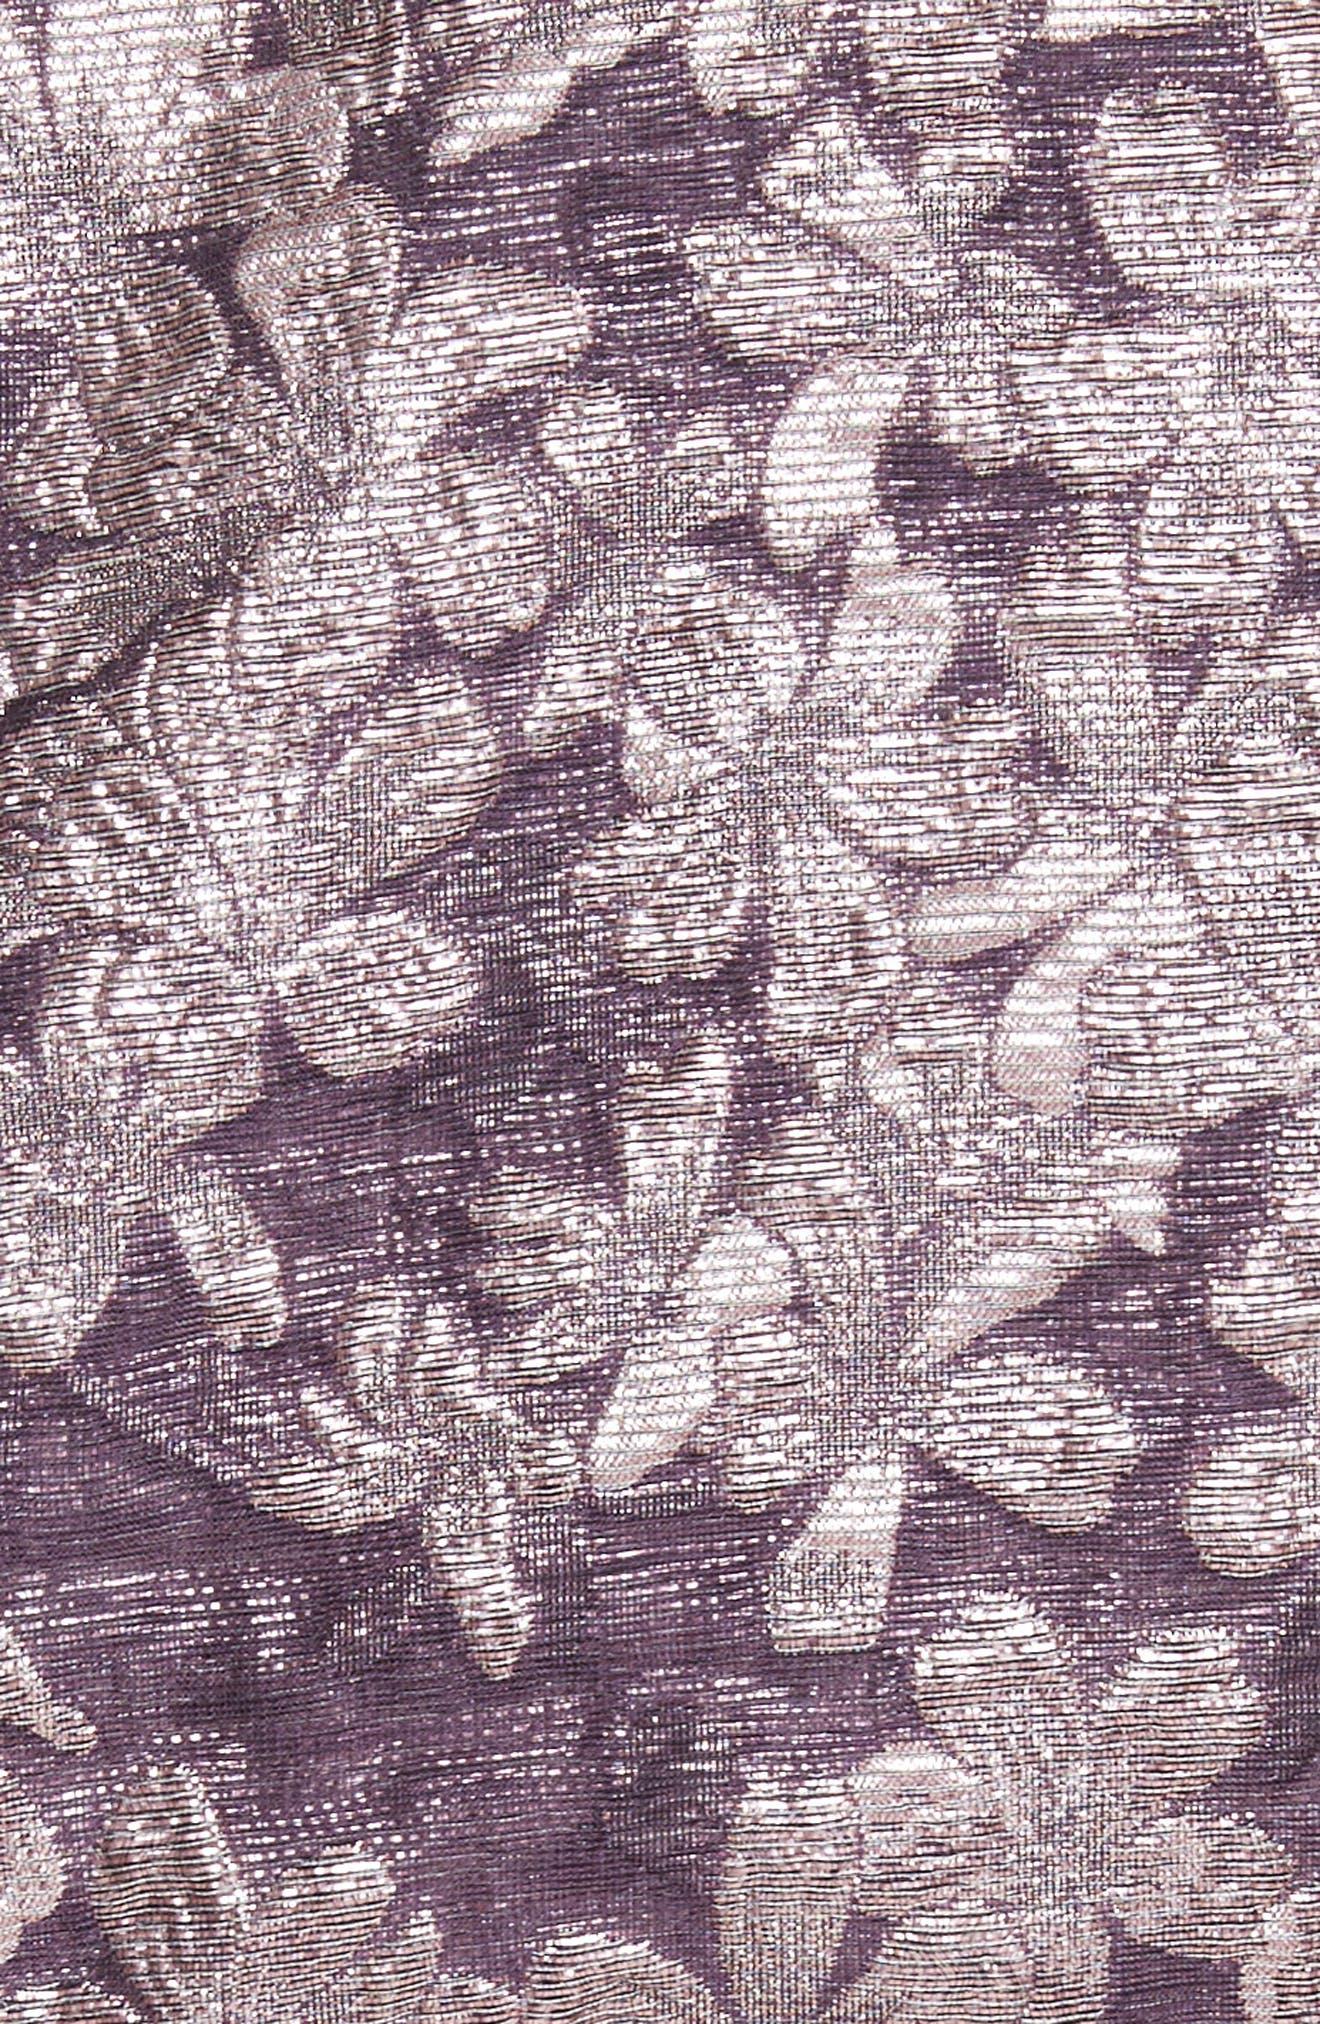 Metallic Floral Jacquard Dress,                             Alternate thumbnail 5, color,                             560